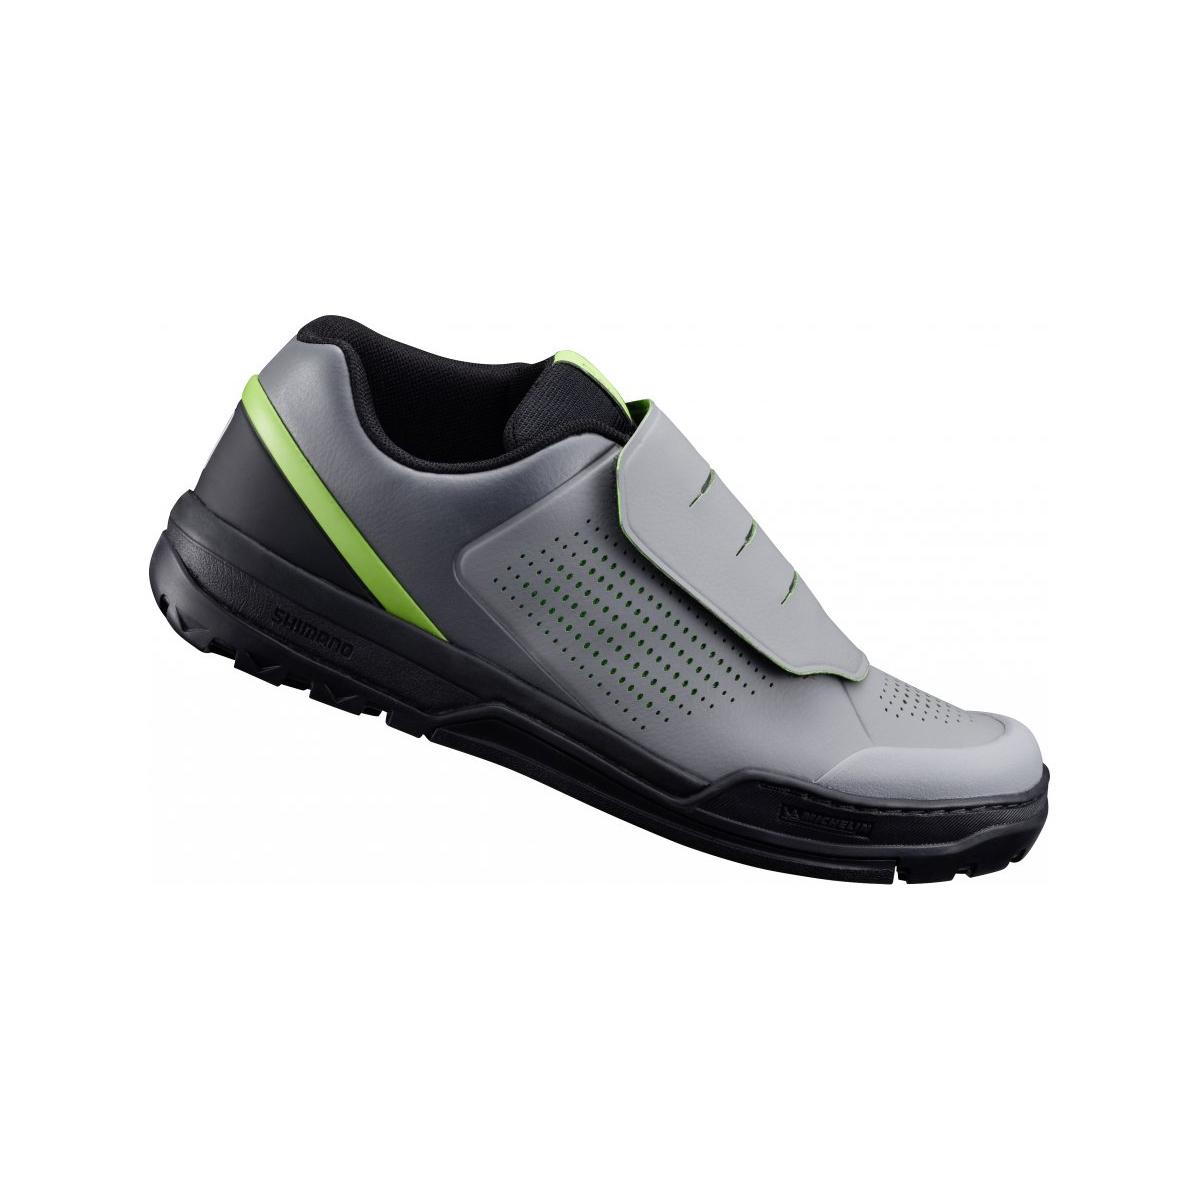 Shimano (GR9) MTB Shoe